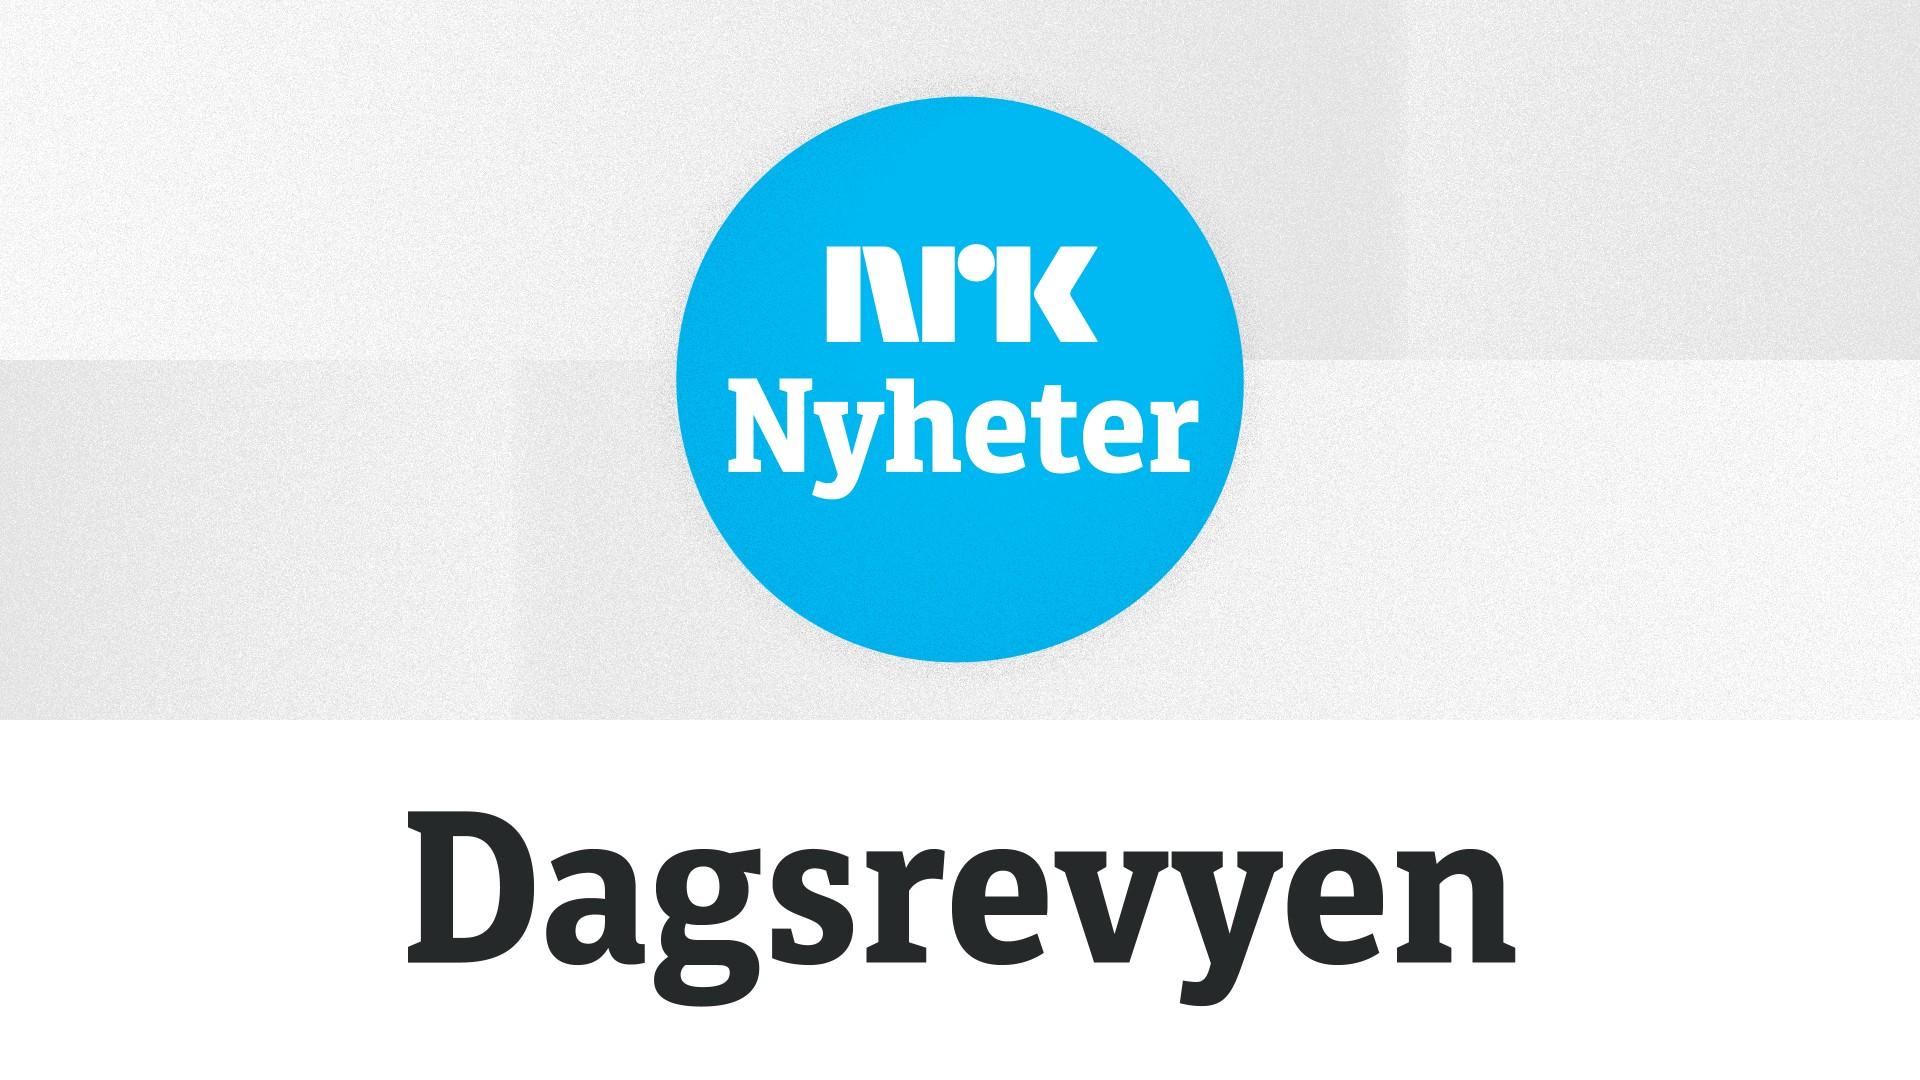 norsk nyheter online